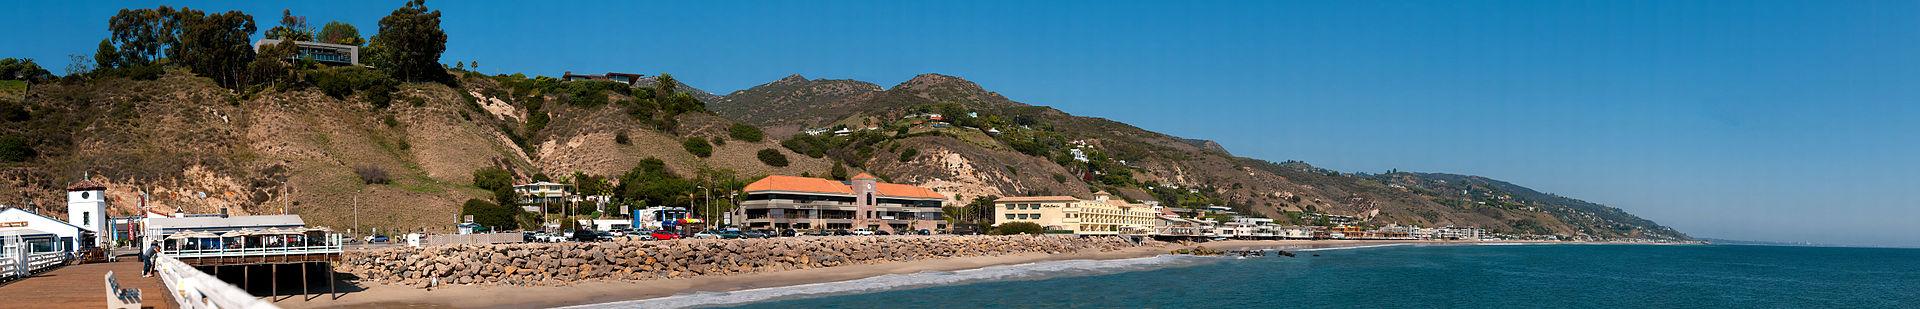 Malibu_Beach_Panorama